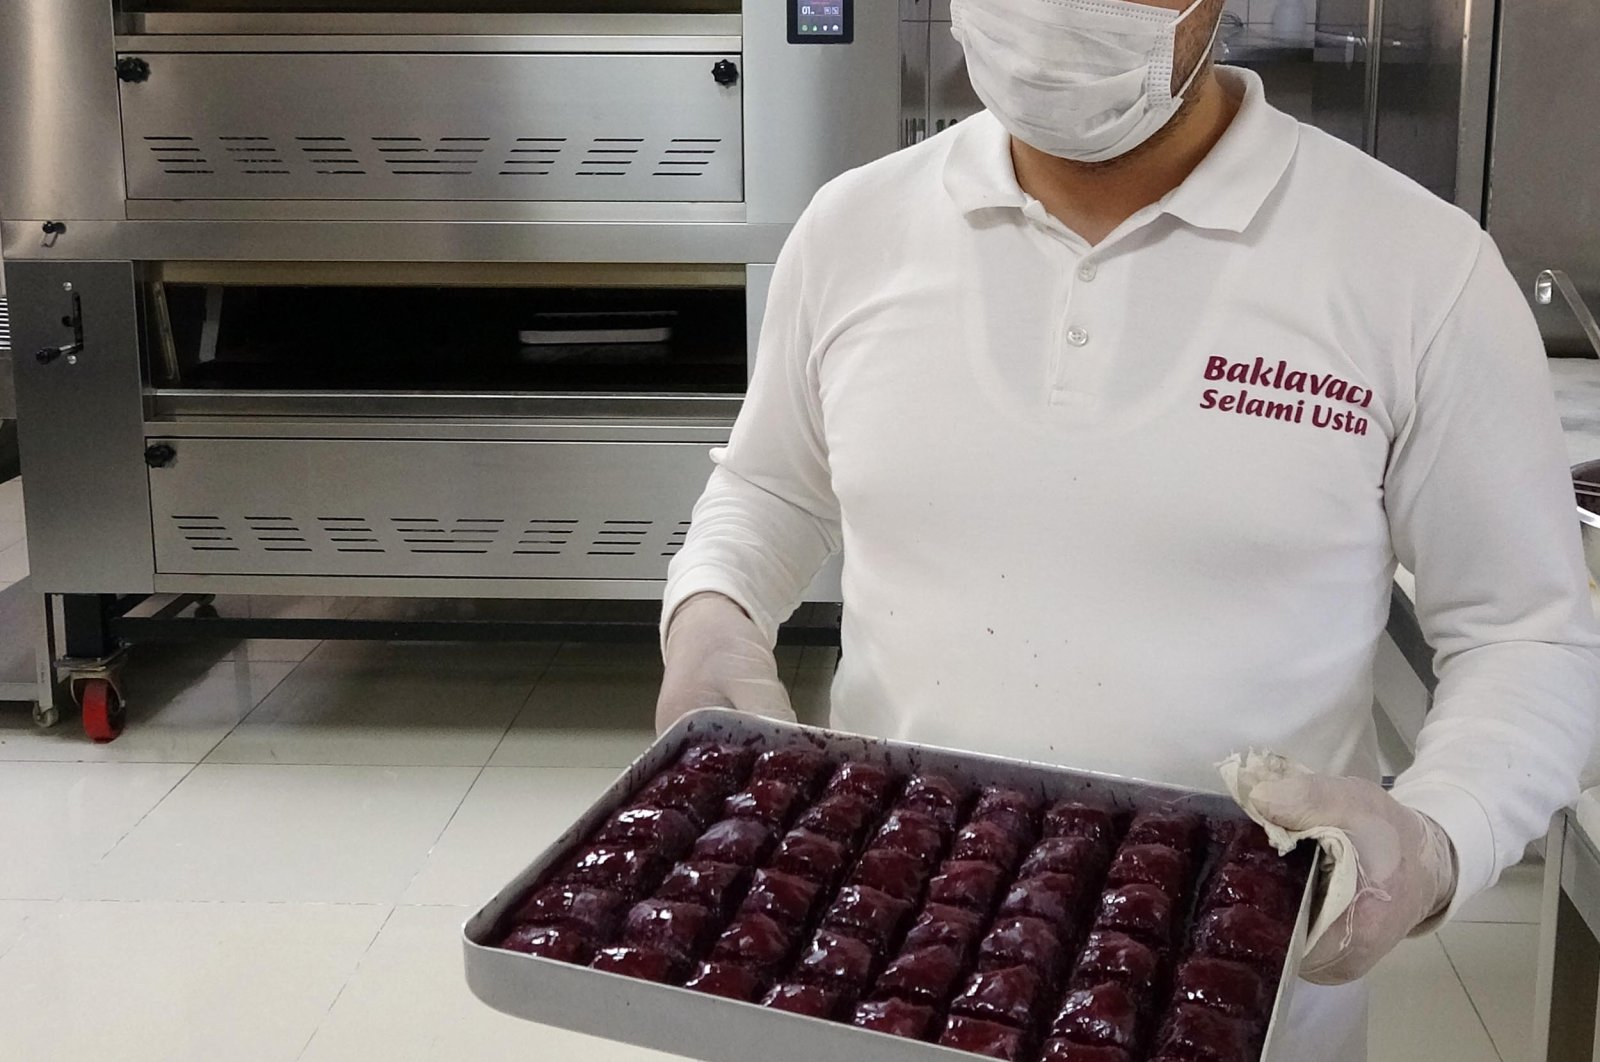 Baker Selami Atiş shows a tray of his diabetes-friendly baklava in Erzurum, eastern Turkey, Aug. 3, 2020. (DHA Photo)